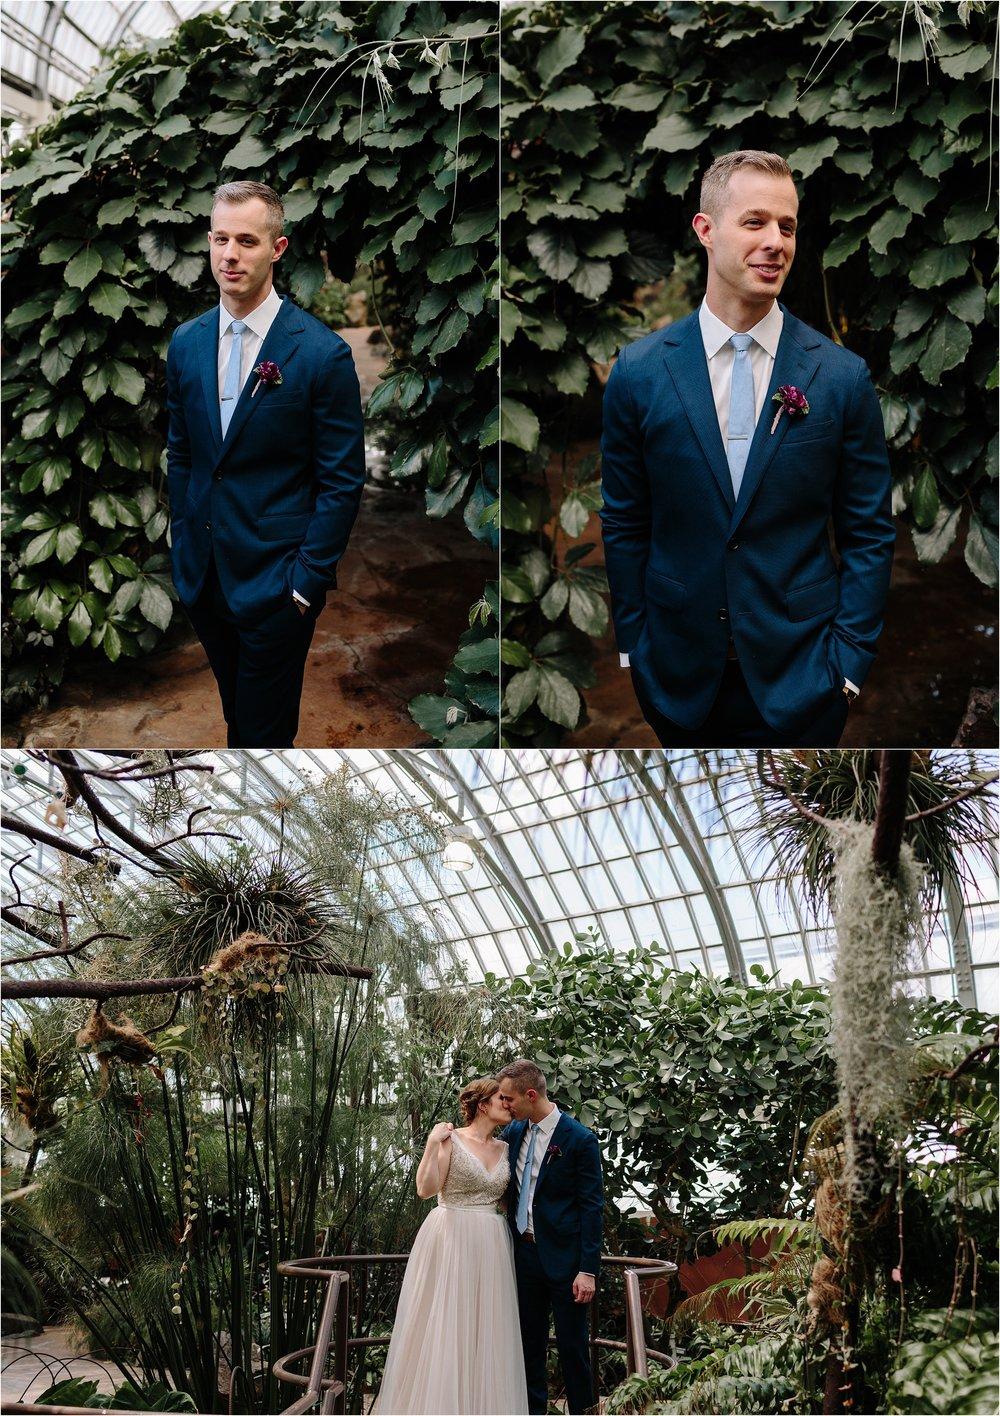 garfield-park-conservatory-wedding-133.jpg